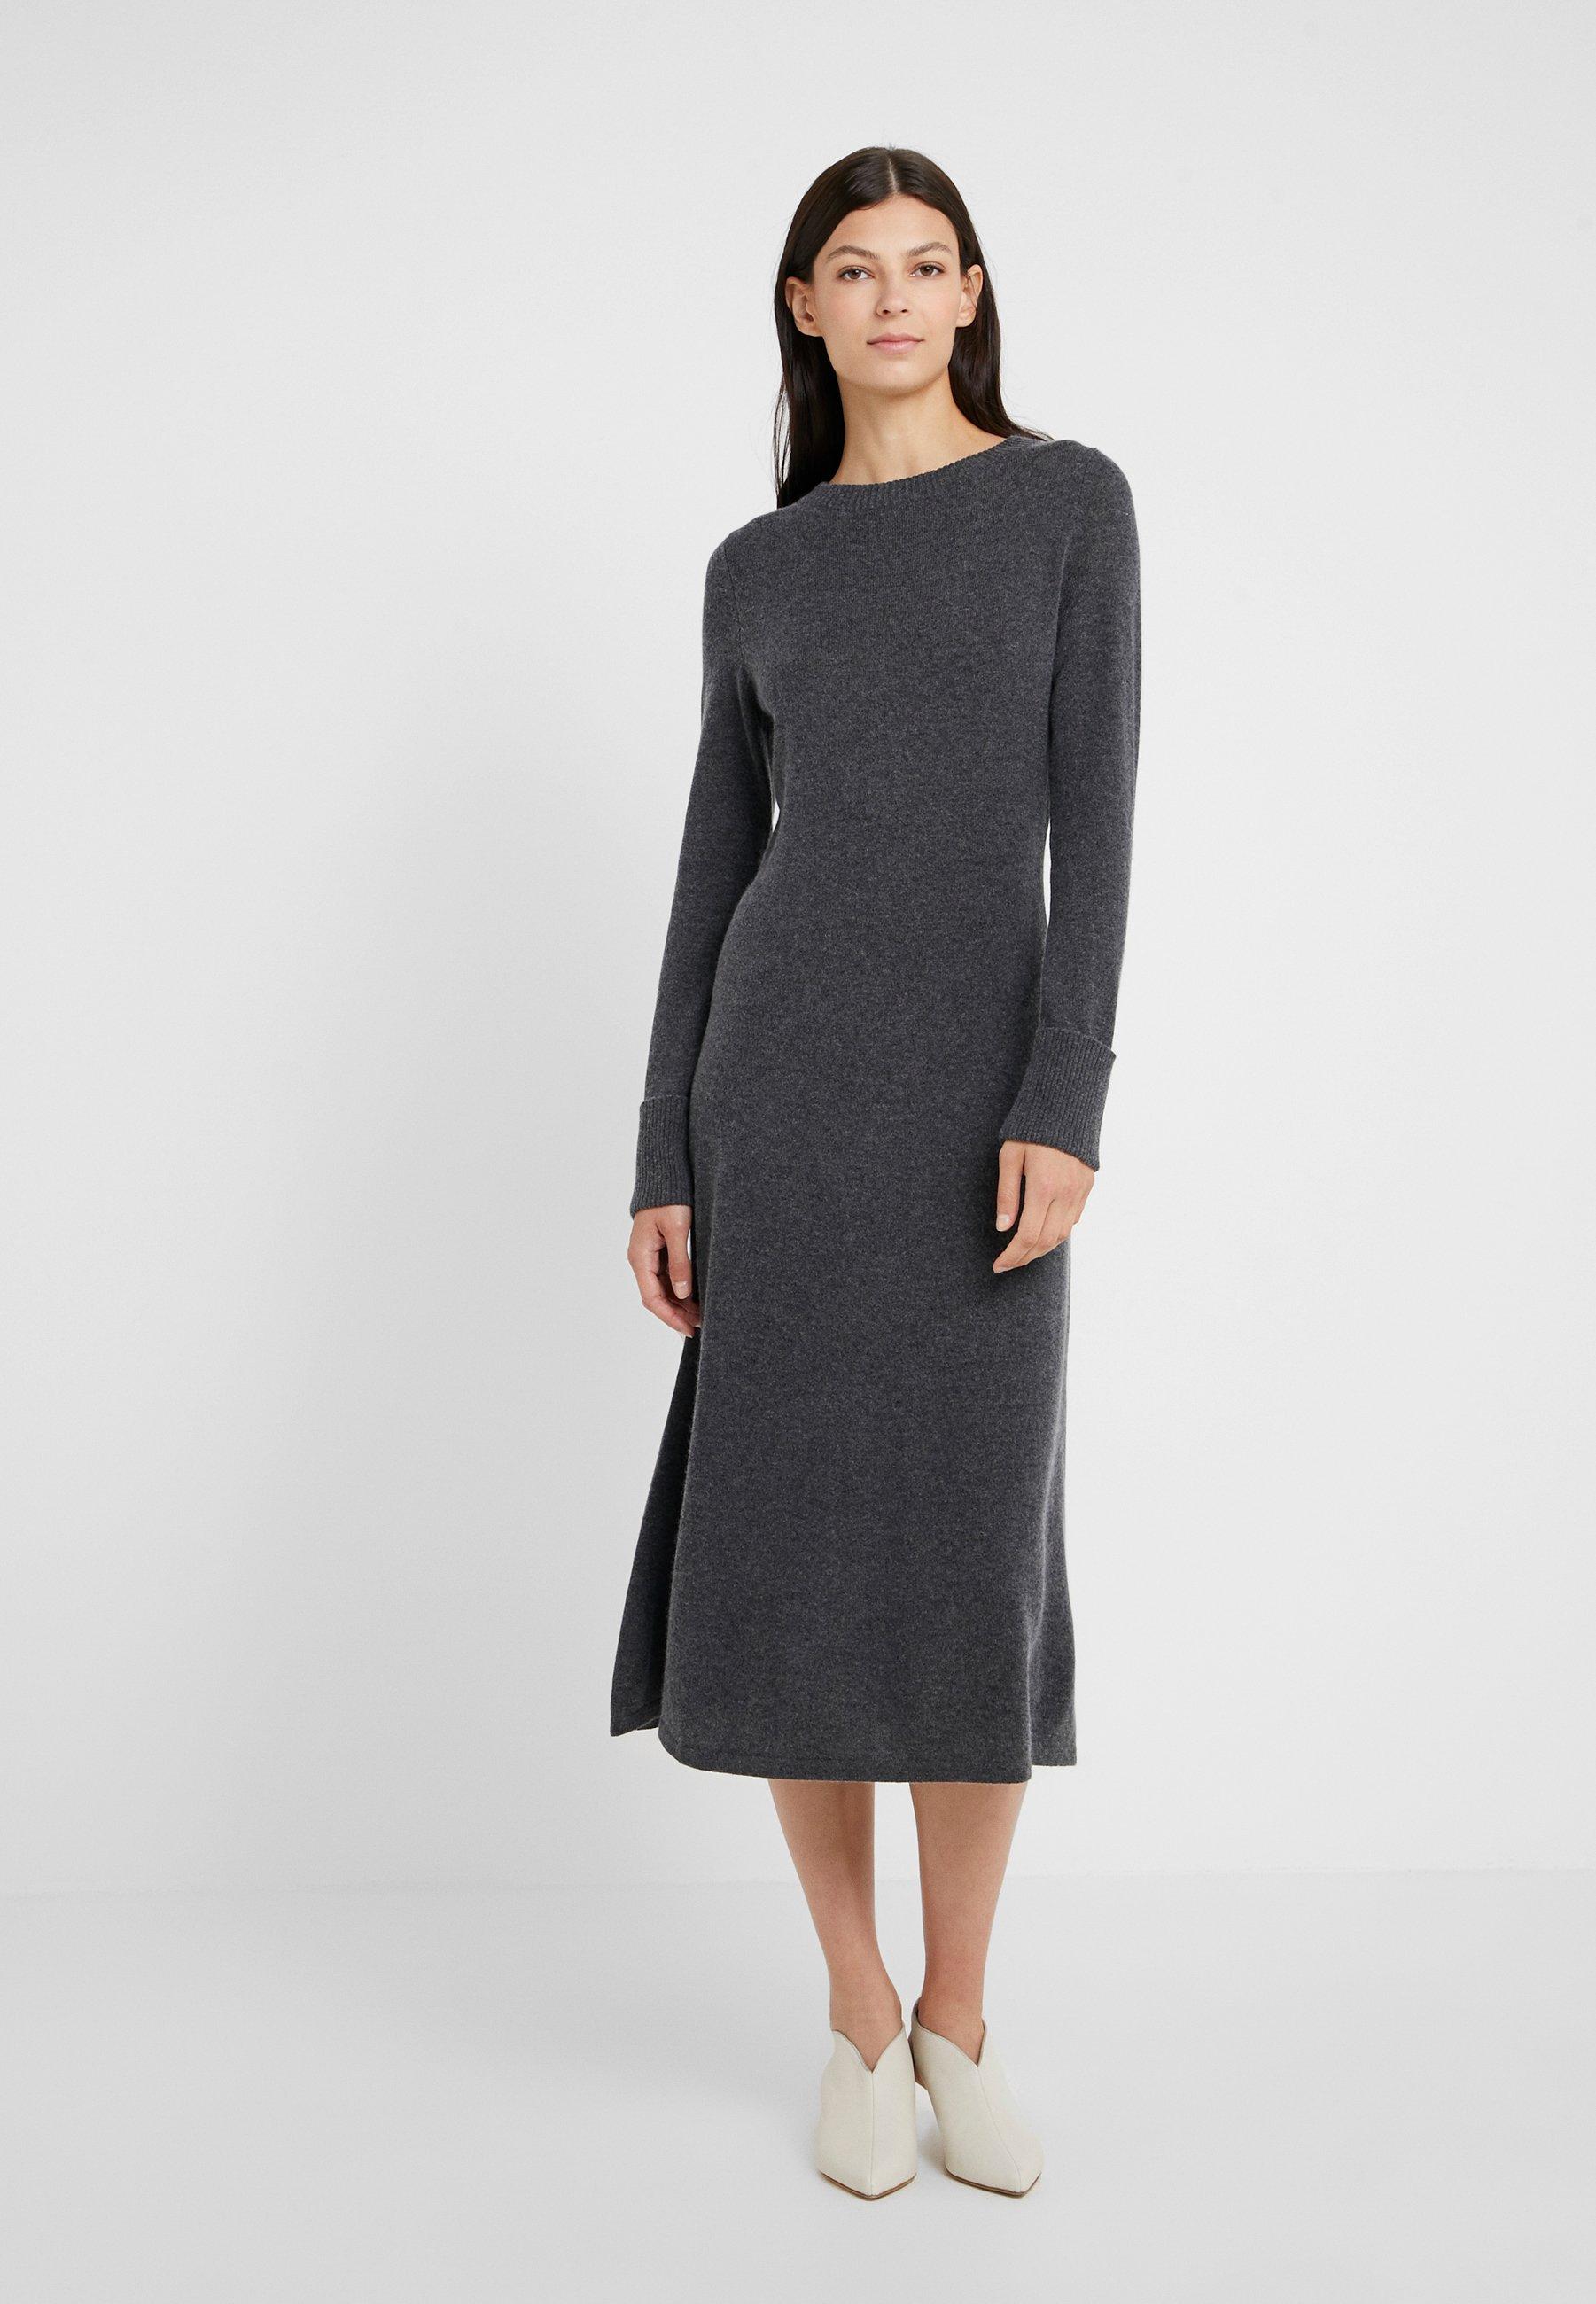 Ftc MockneckRobe Pull Dress Shale Cashmere CthdxQrs